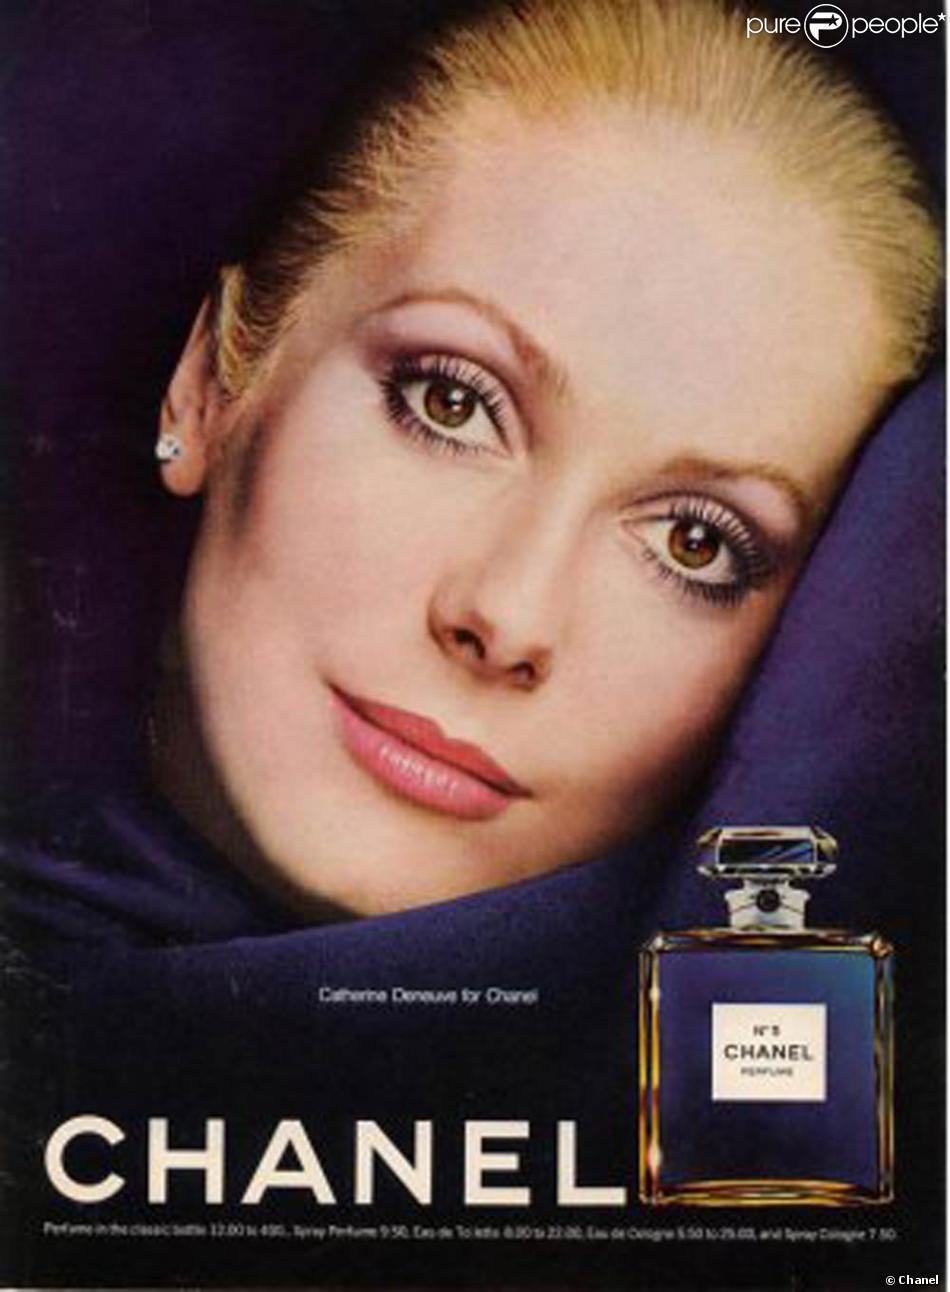 catherine deneuve pour la campagne du parfum chanel n 5 purepeople. Black Bedroom Furniture Sets. Home Design Ideas